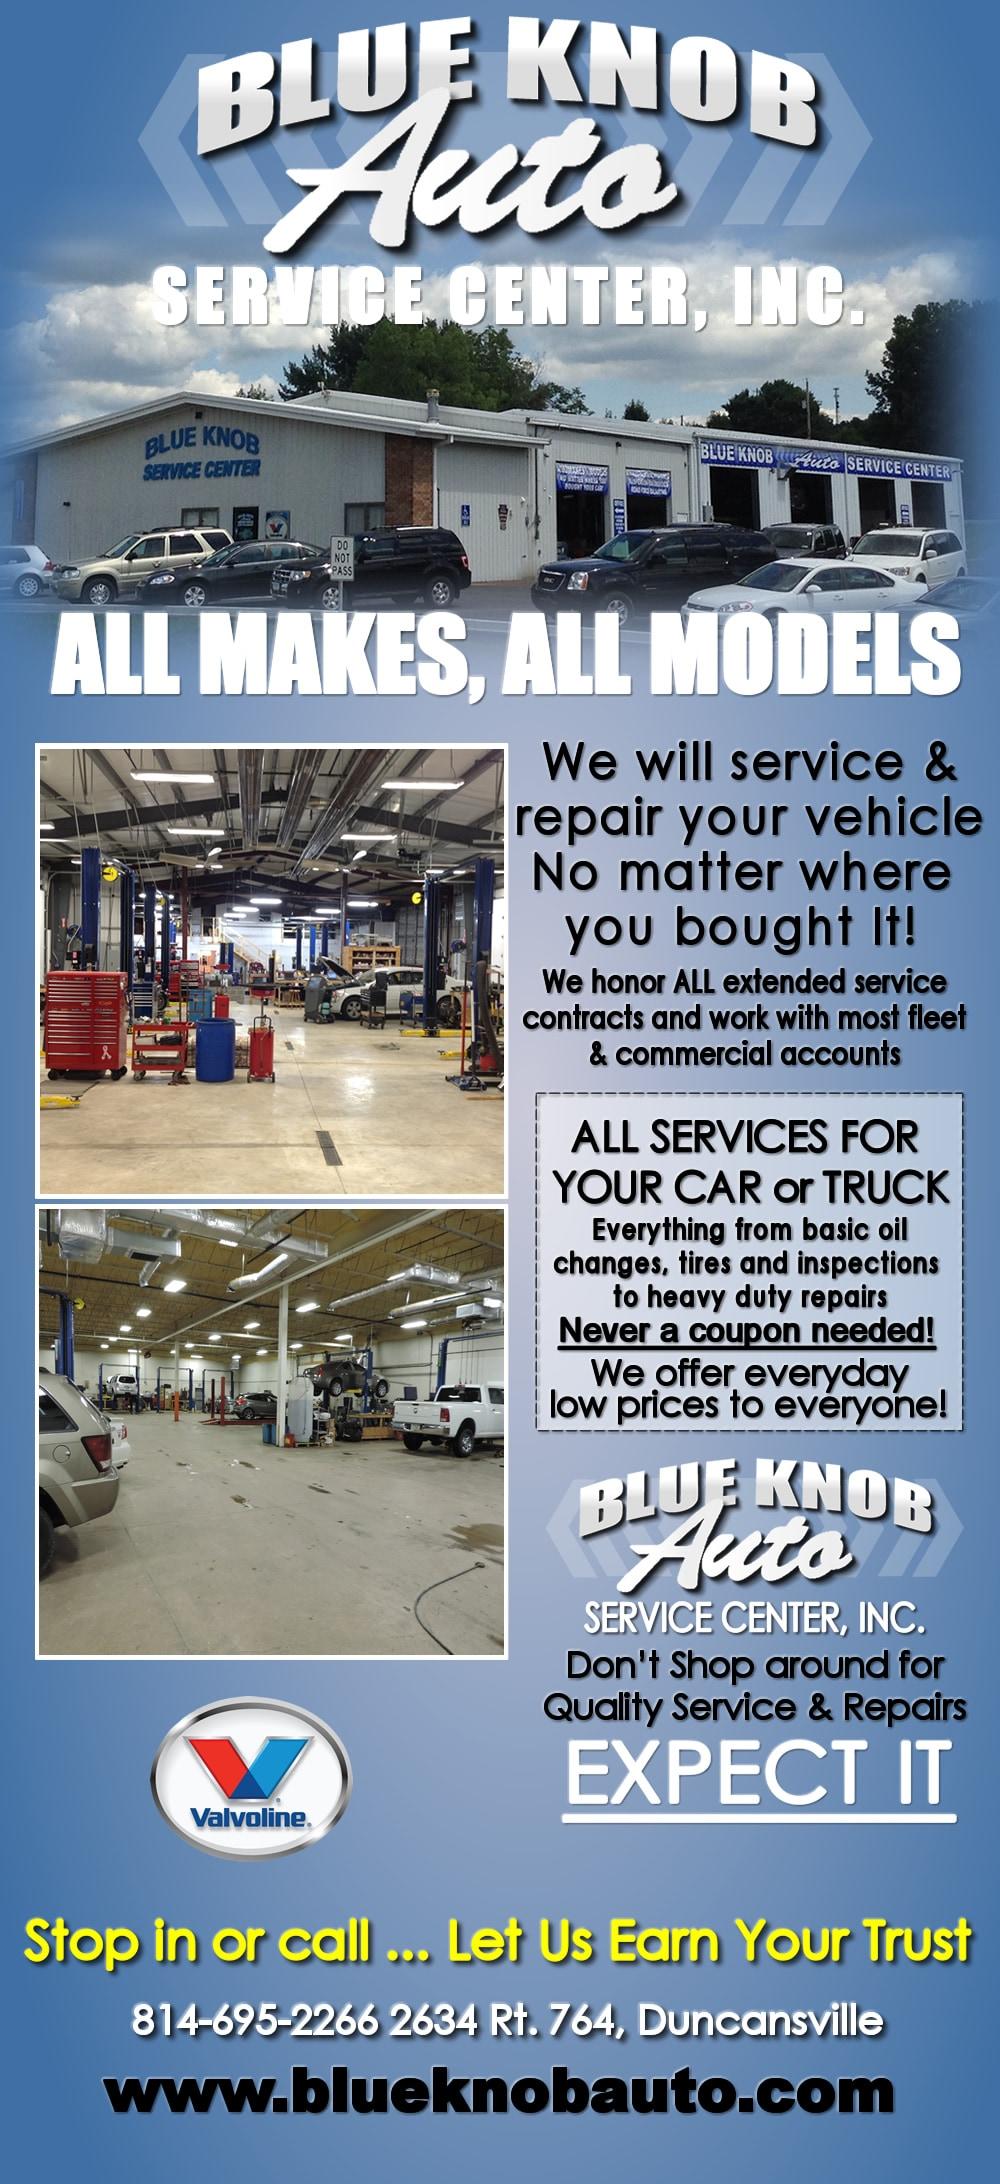 blue knob auto altoona pa service center auto repair duncansville altoona. Black Bedroom Furniture Sets. Home Design Ideas